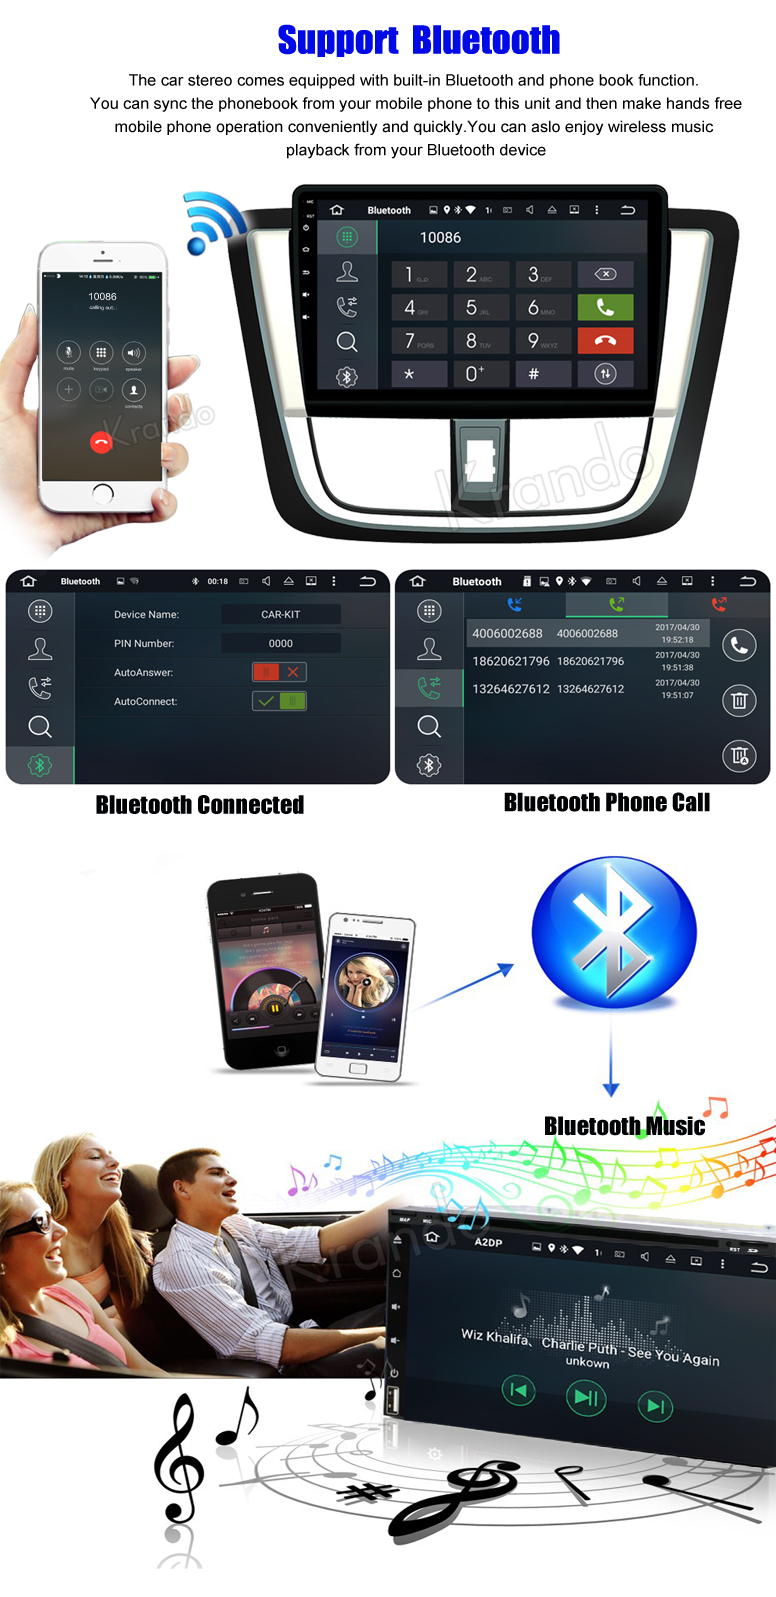 "Krando Android 6.0 10.1"" touch screen car radio for toyota vios yaris 2017 2018 car multimedia WIFI 4G LTE 2G RAM KD-TY017"